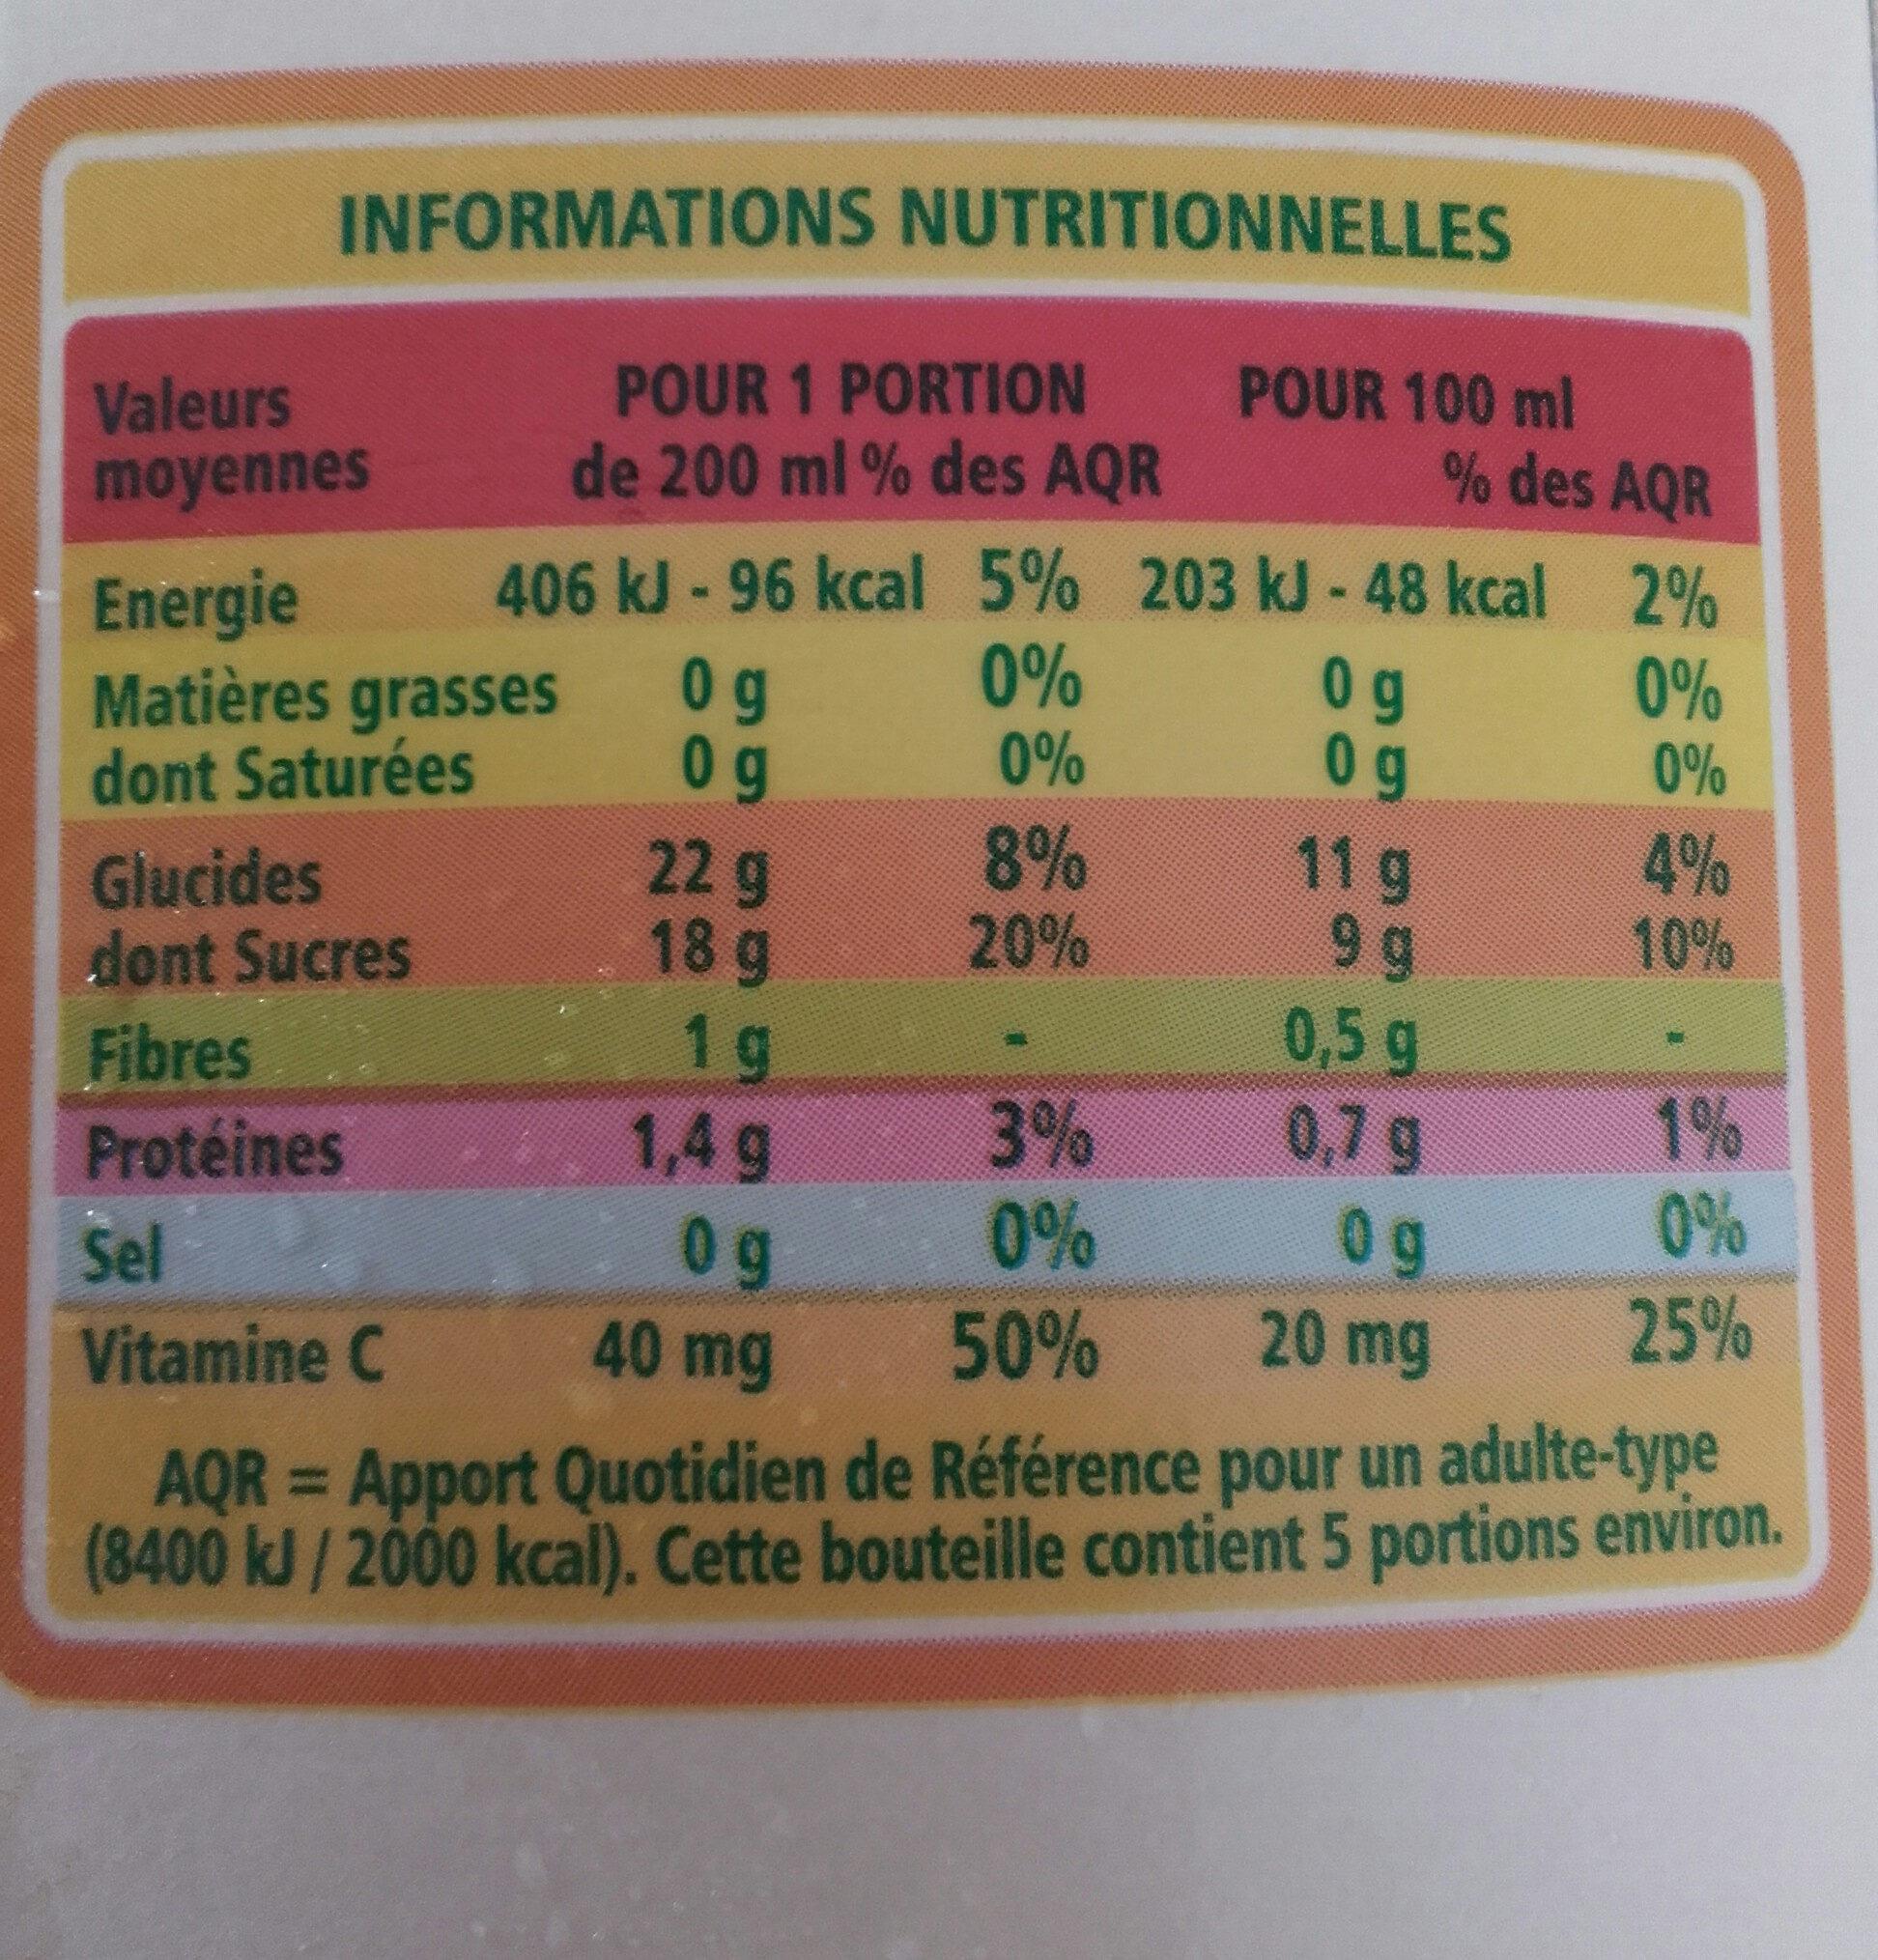 jus d Orange - Informations nutritionnelles - fr